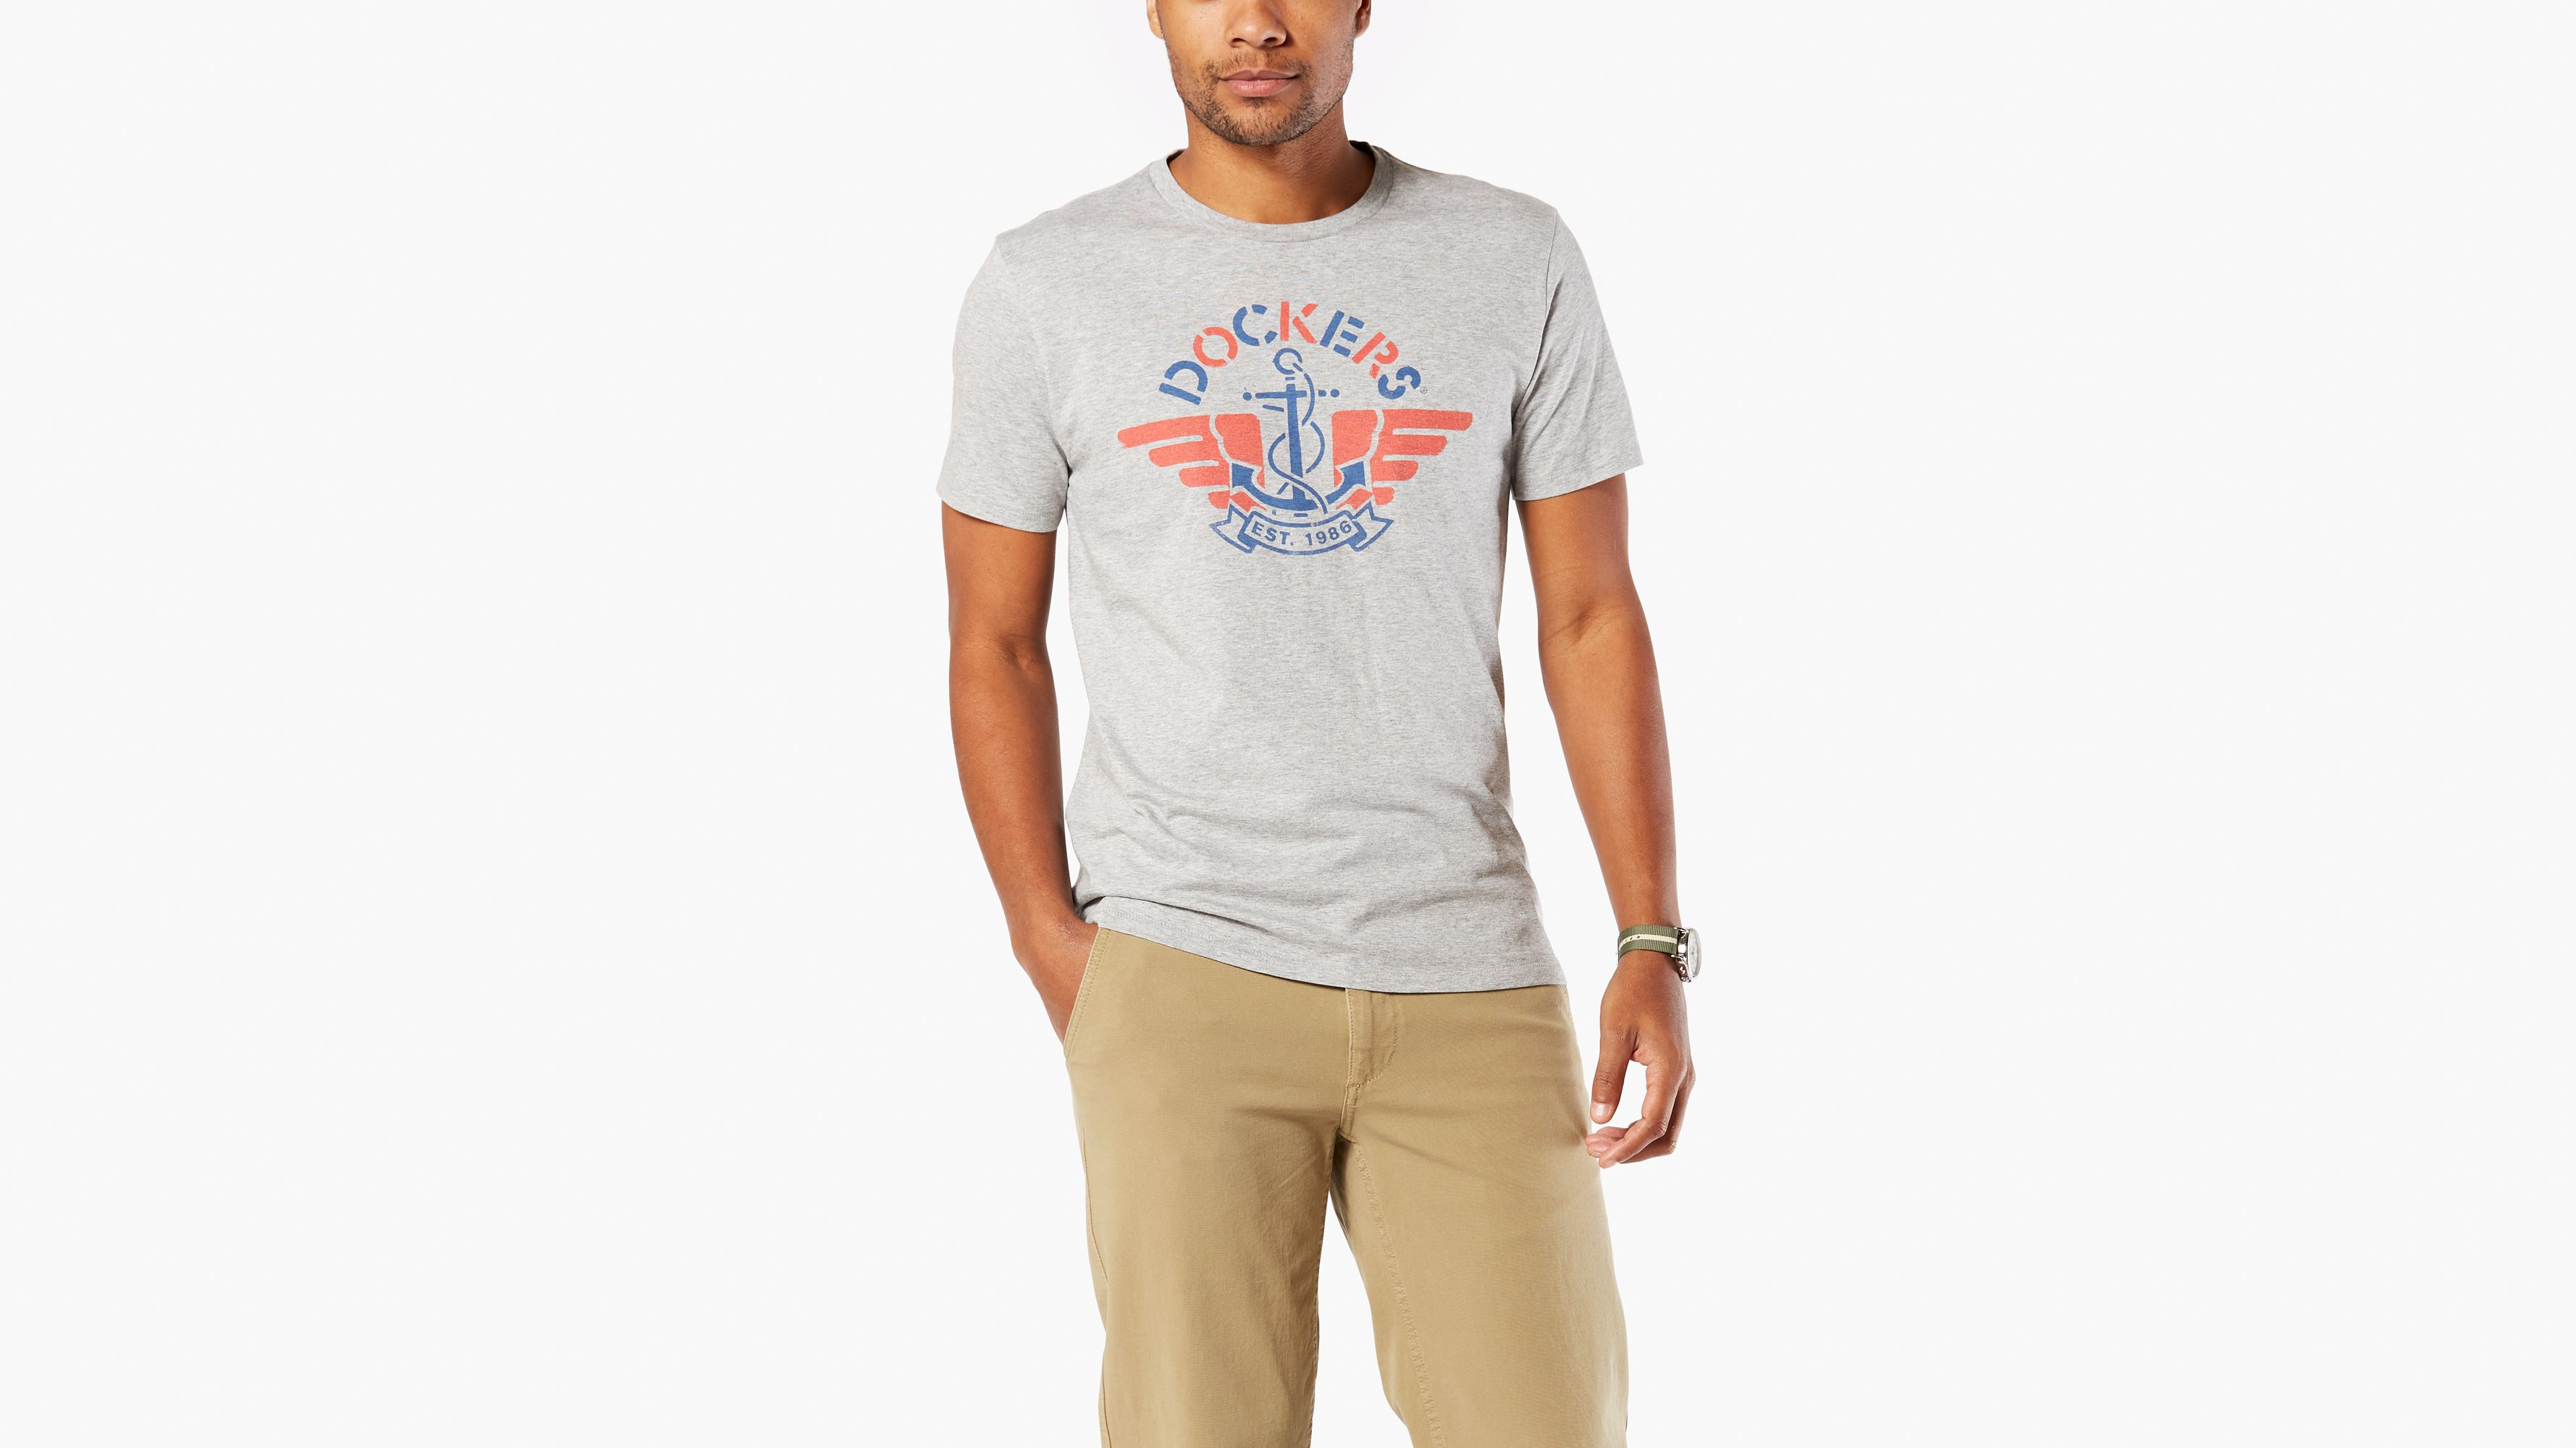 Tee Es Dockers® Tee Logo Dockers® Logo Grey Grey IBxwqUZ1